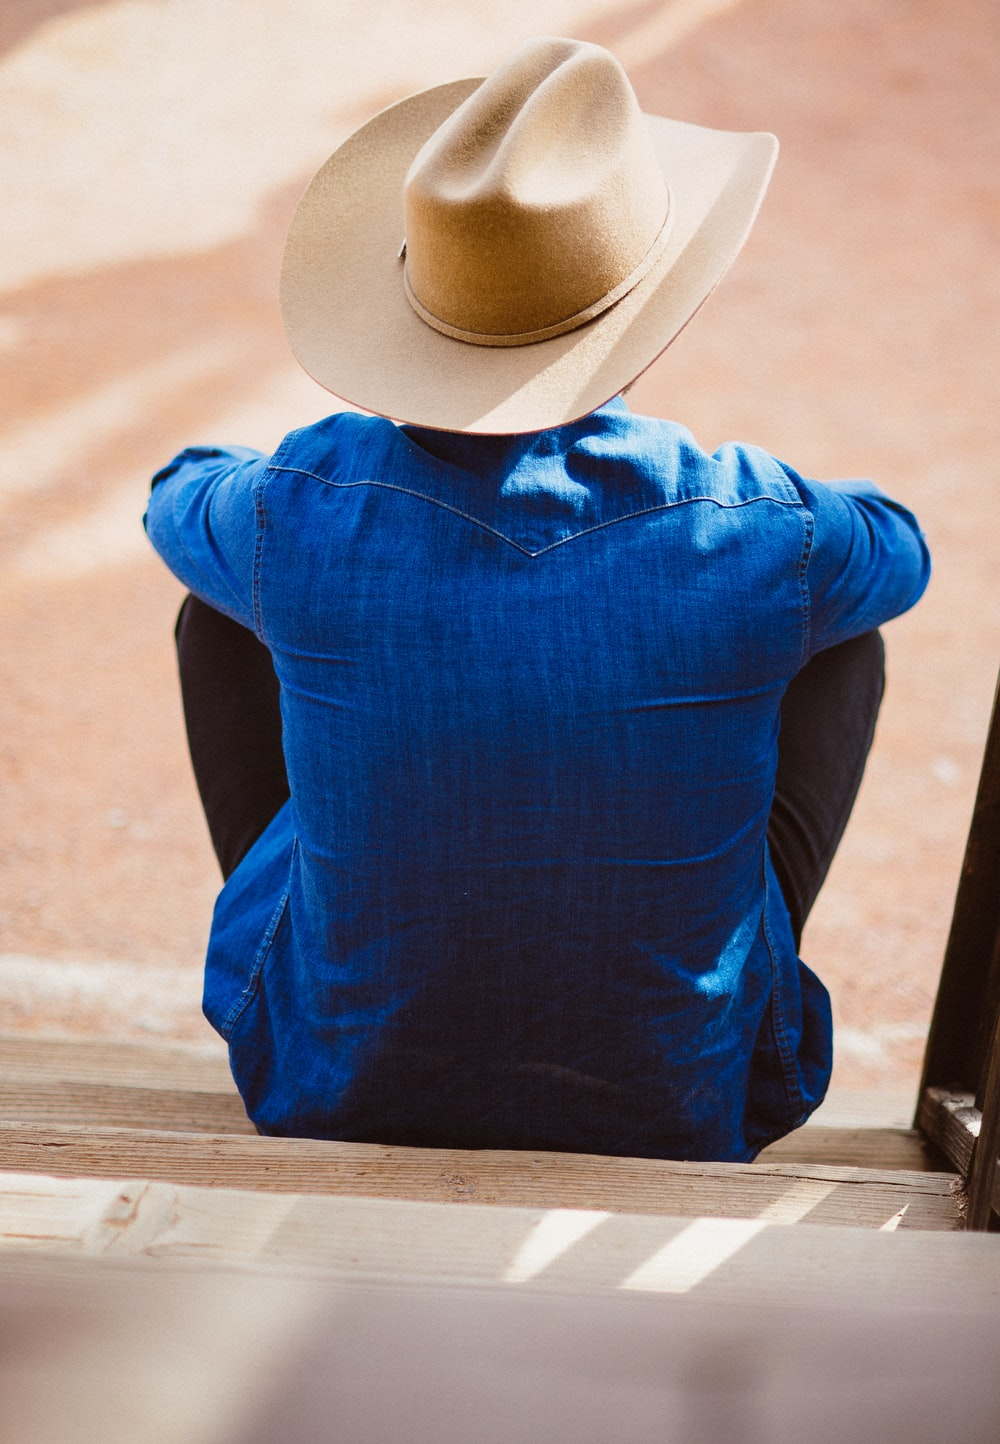 man wearing blue dress shirt and beige cowboy hat